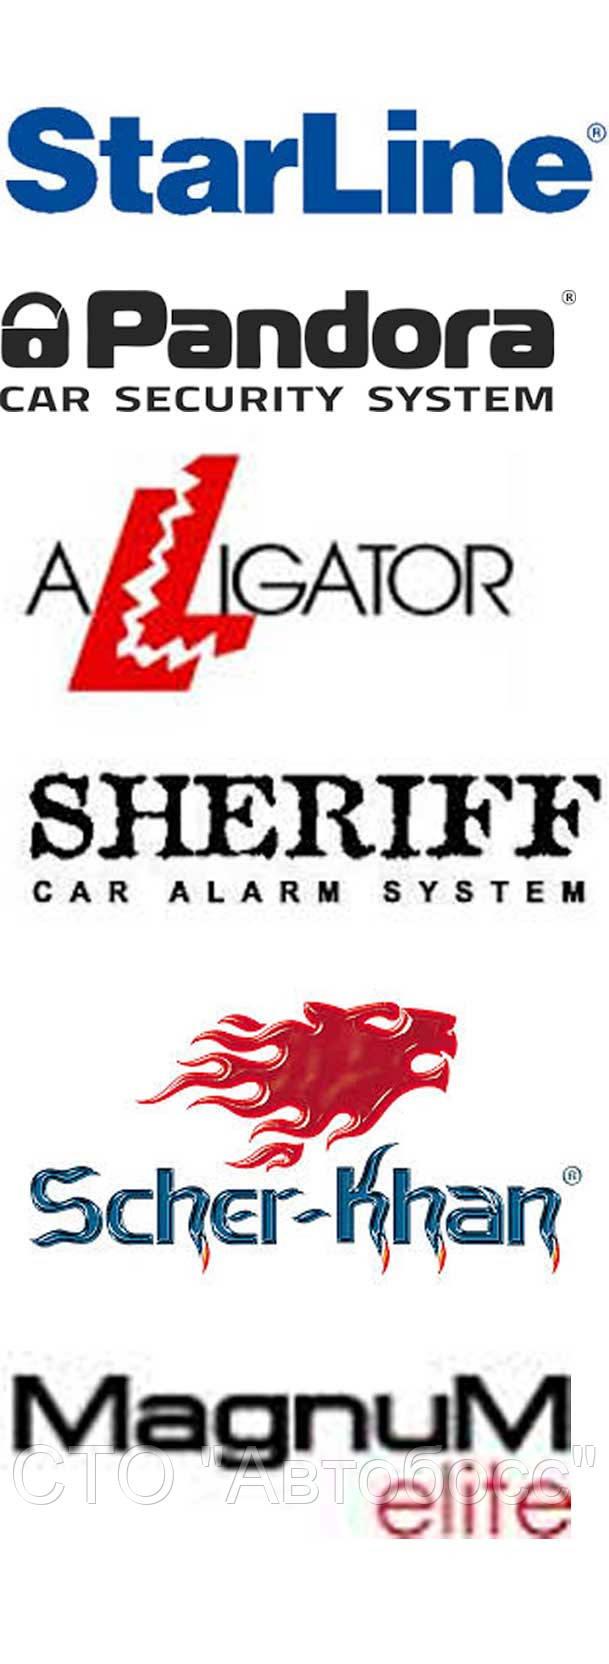 Установка сигнализаций т.м. StarLine, Pandora, Sheriff, Magnum Elite и др.